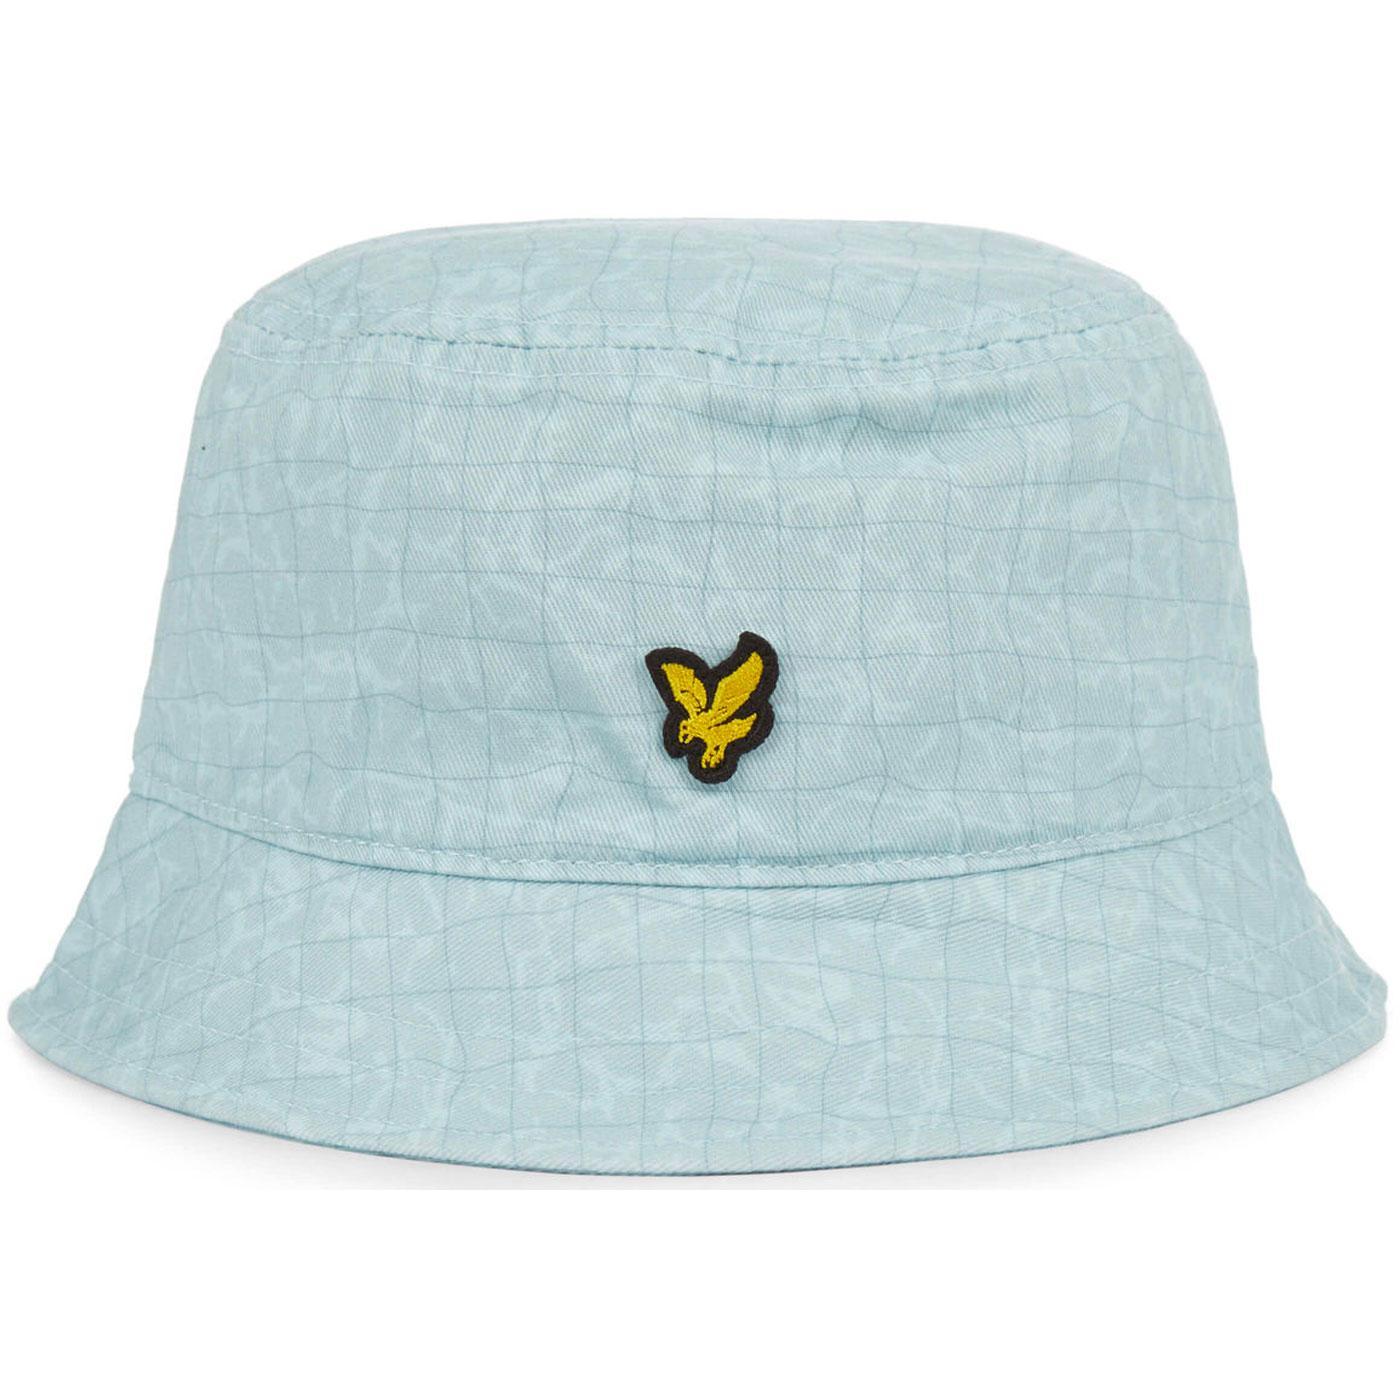 LYLE & SCOTT Retro 90s Pool Print Bucket Hat (BS)